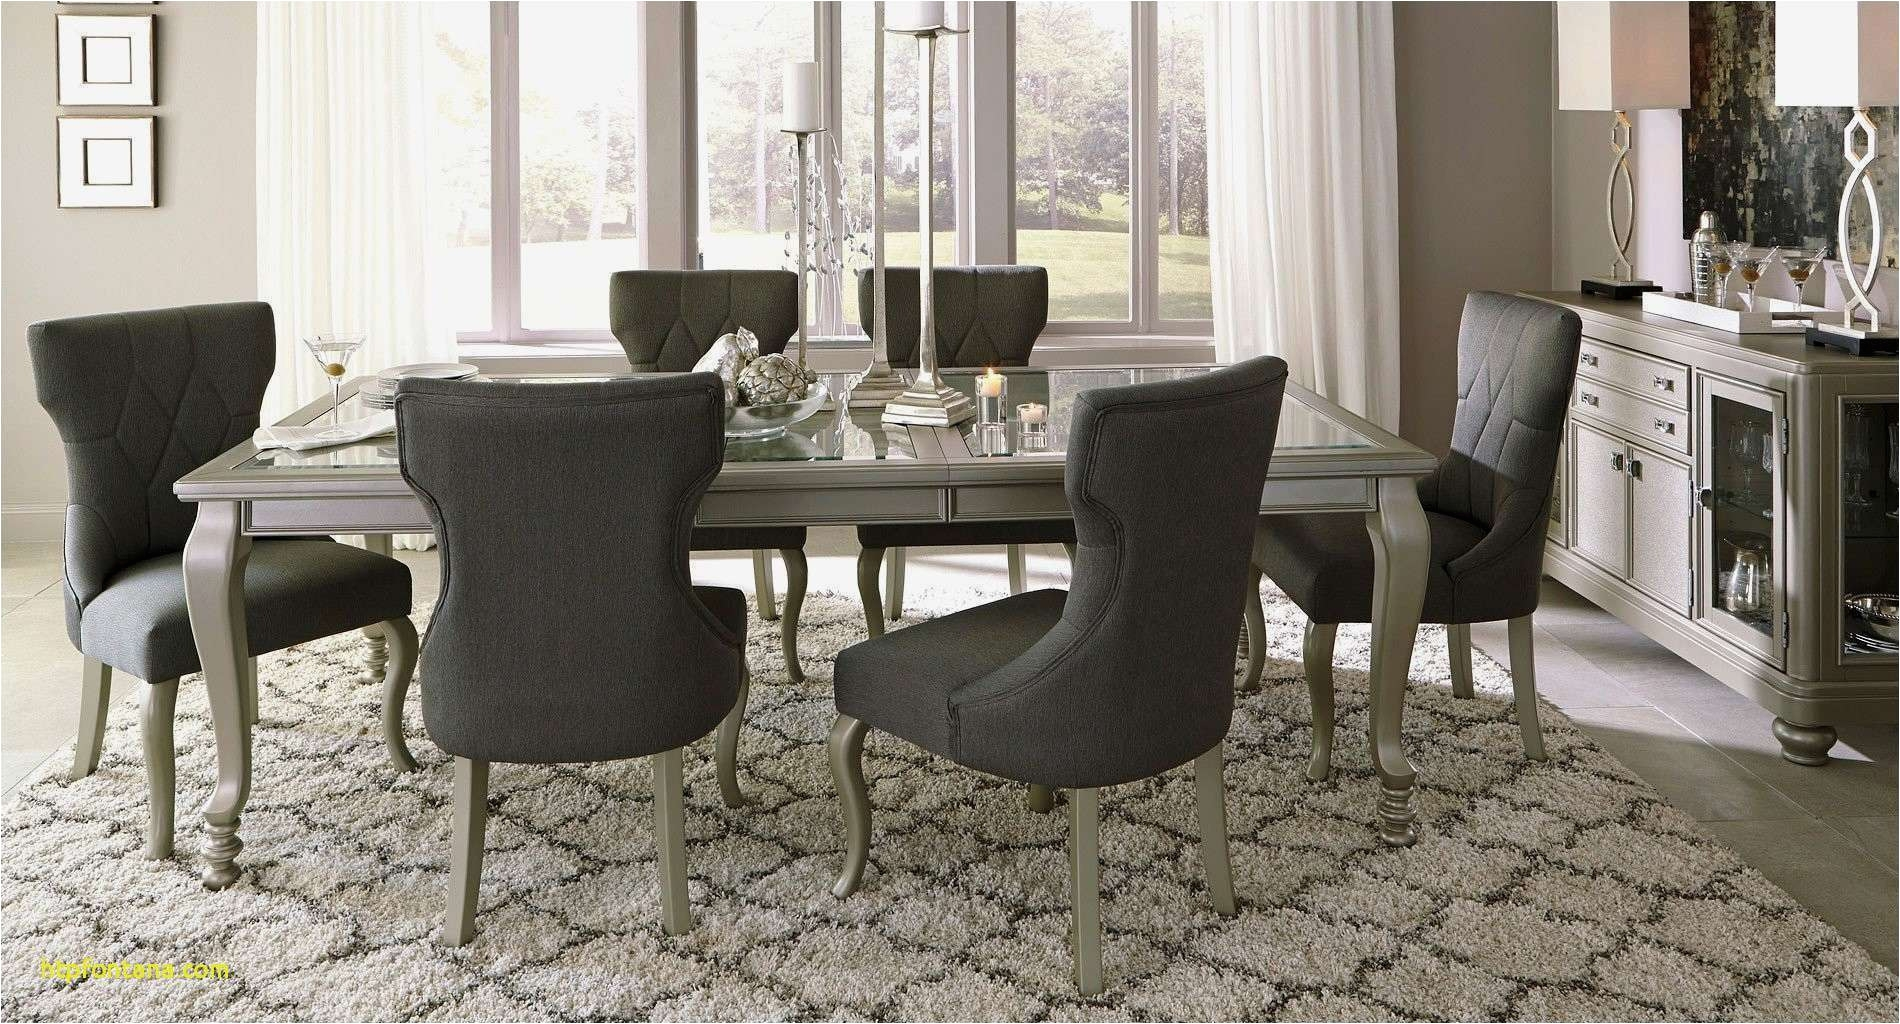 i love living furniture fresh 55 fresh italian living room furniture exitrealestate540 pics of i love